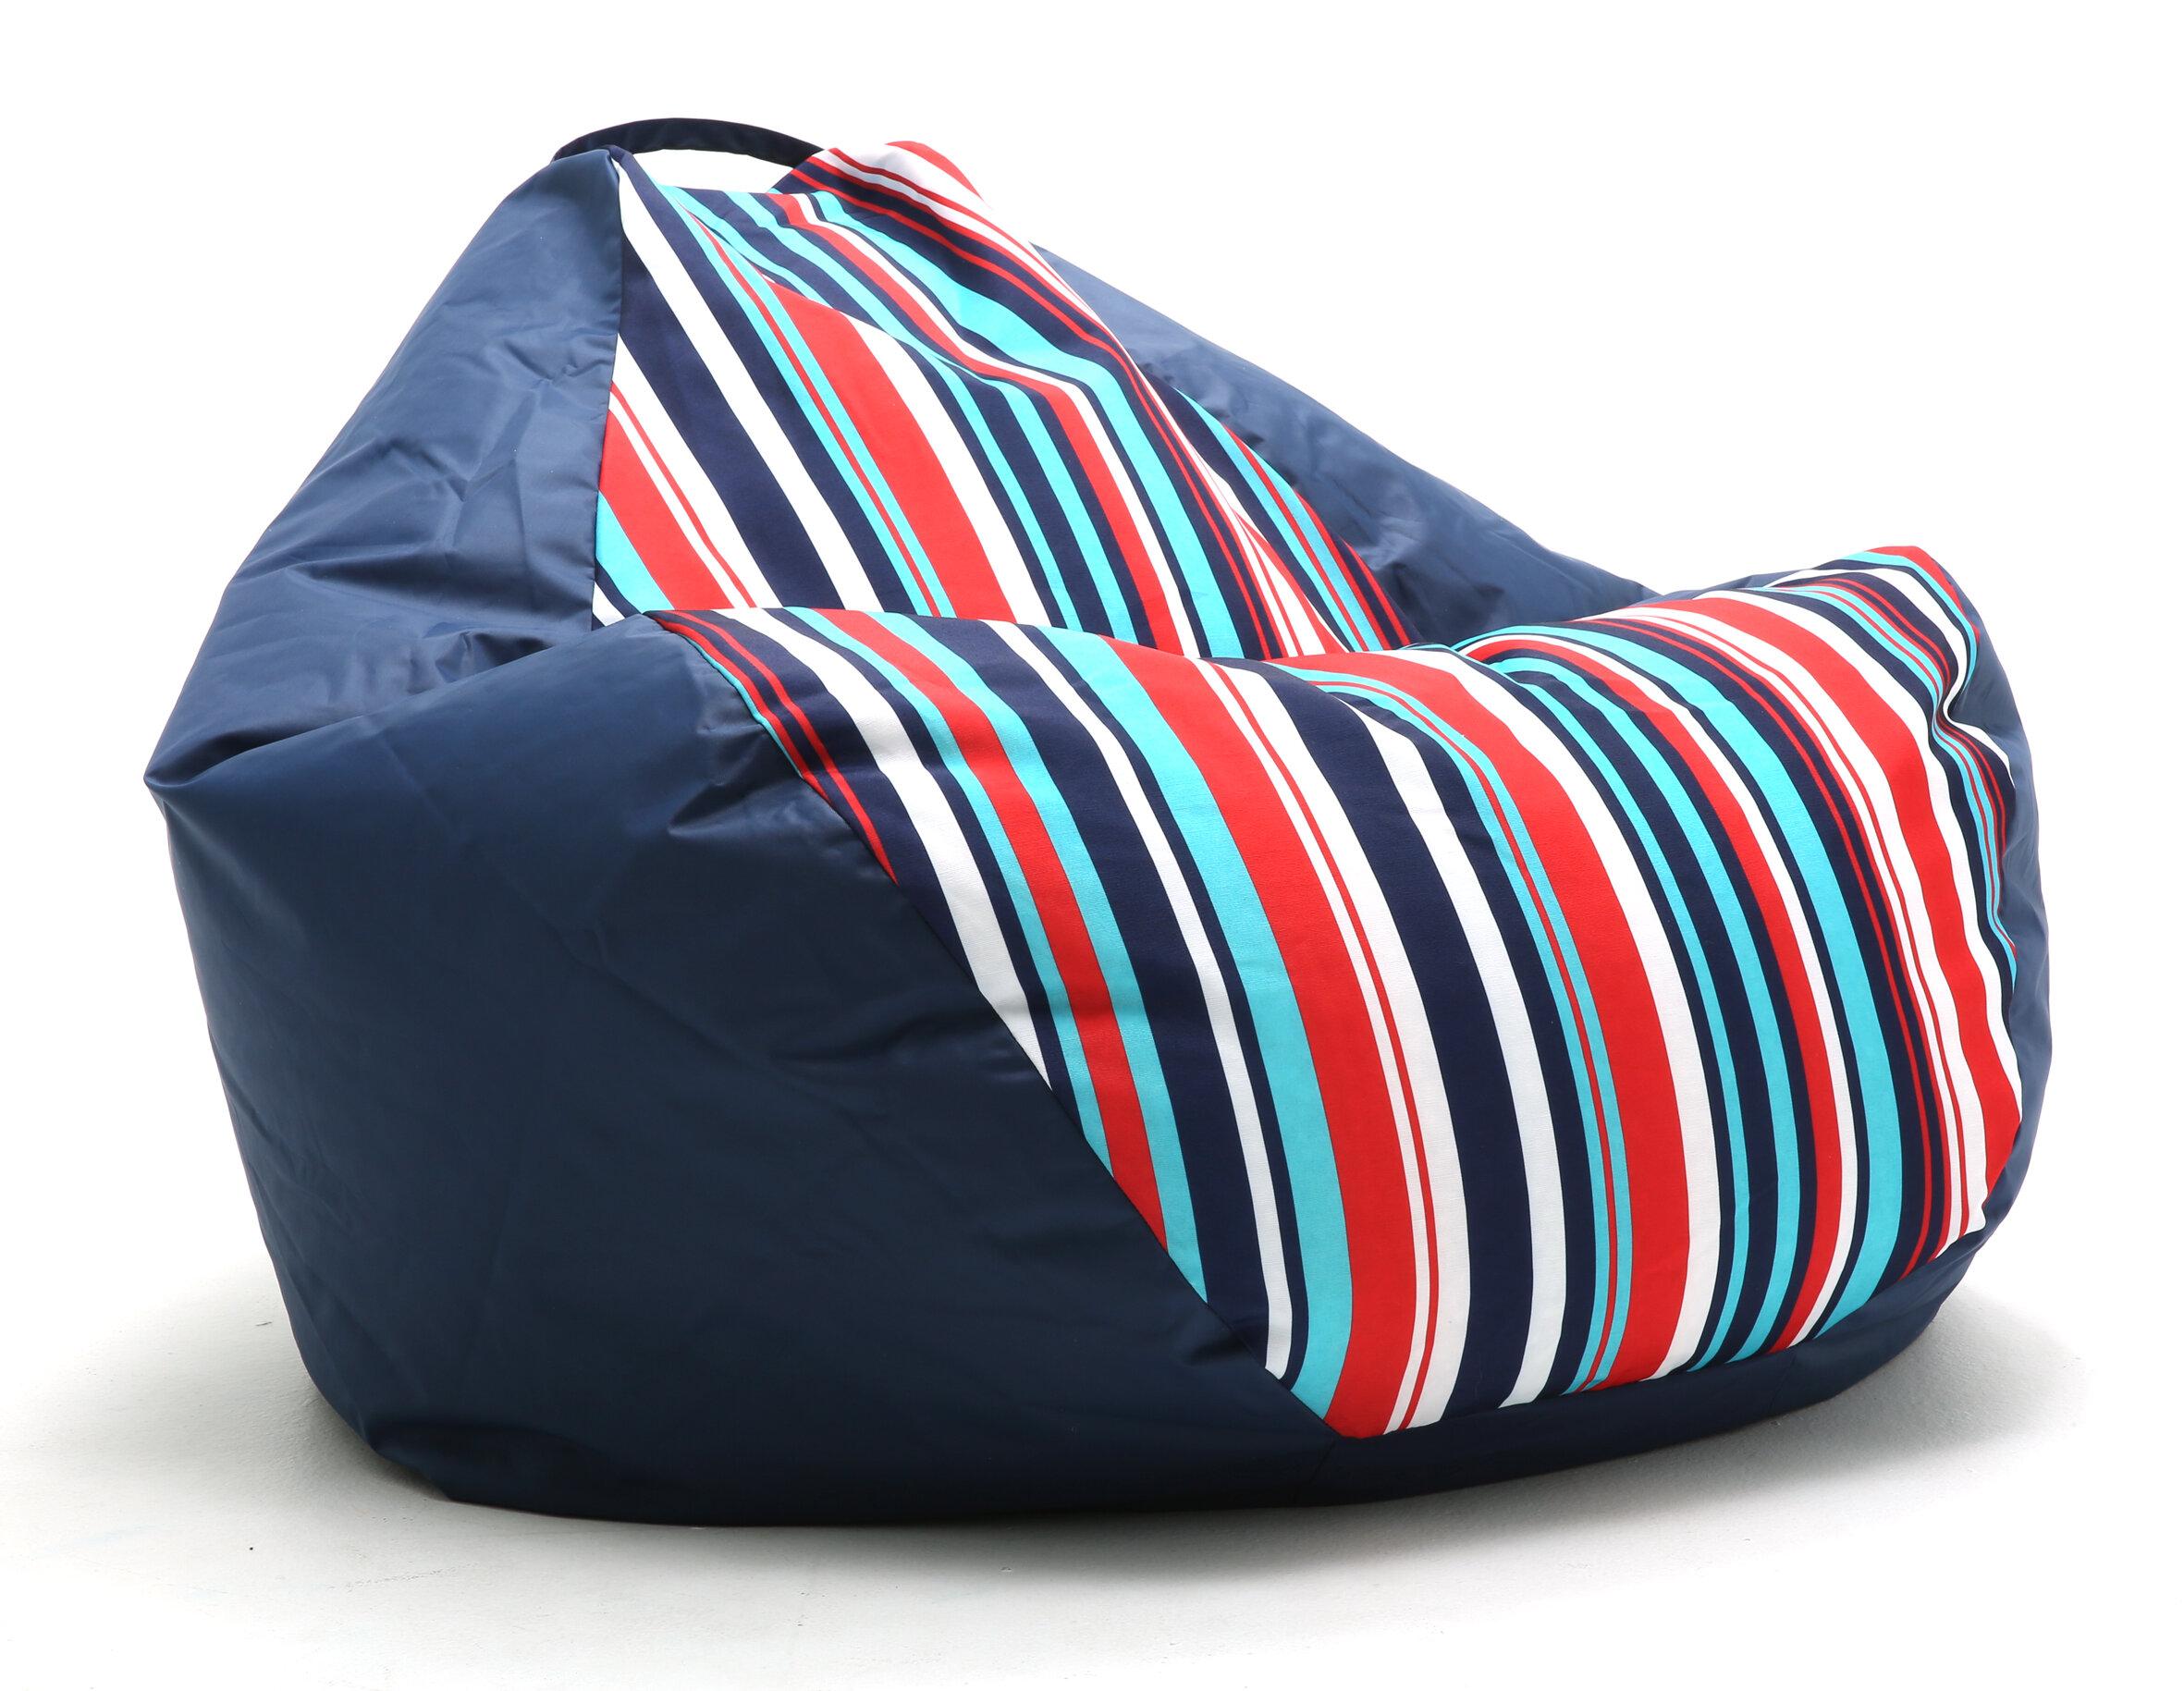 Comfort Research Big Joe Outdoor Teardrop Cozumel Stripe Bean Bag Chair |  Wayfair